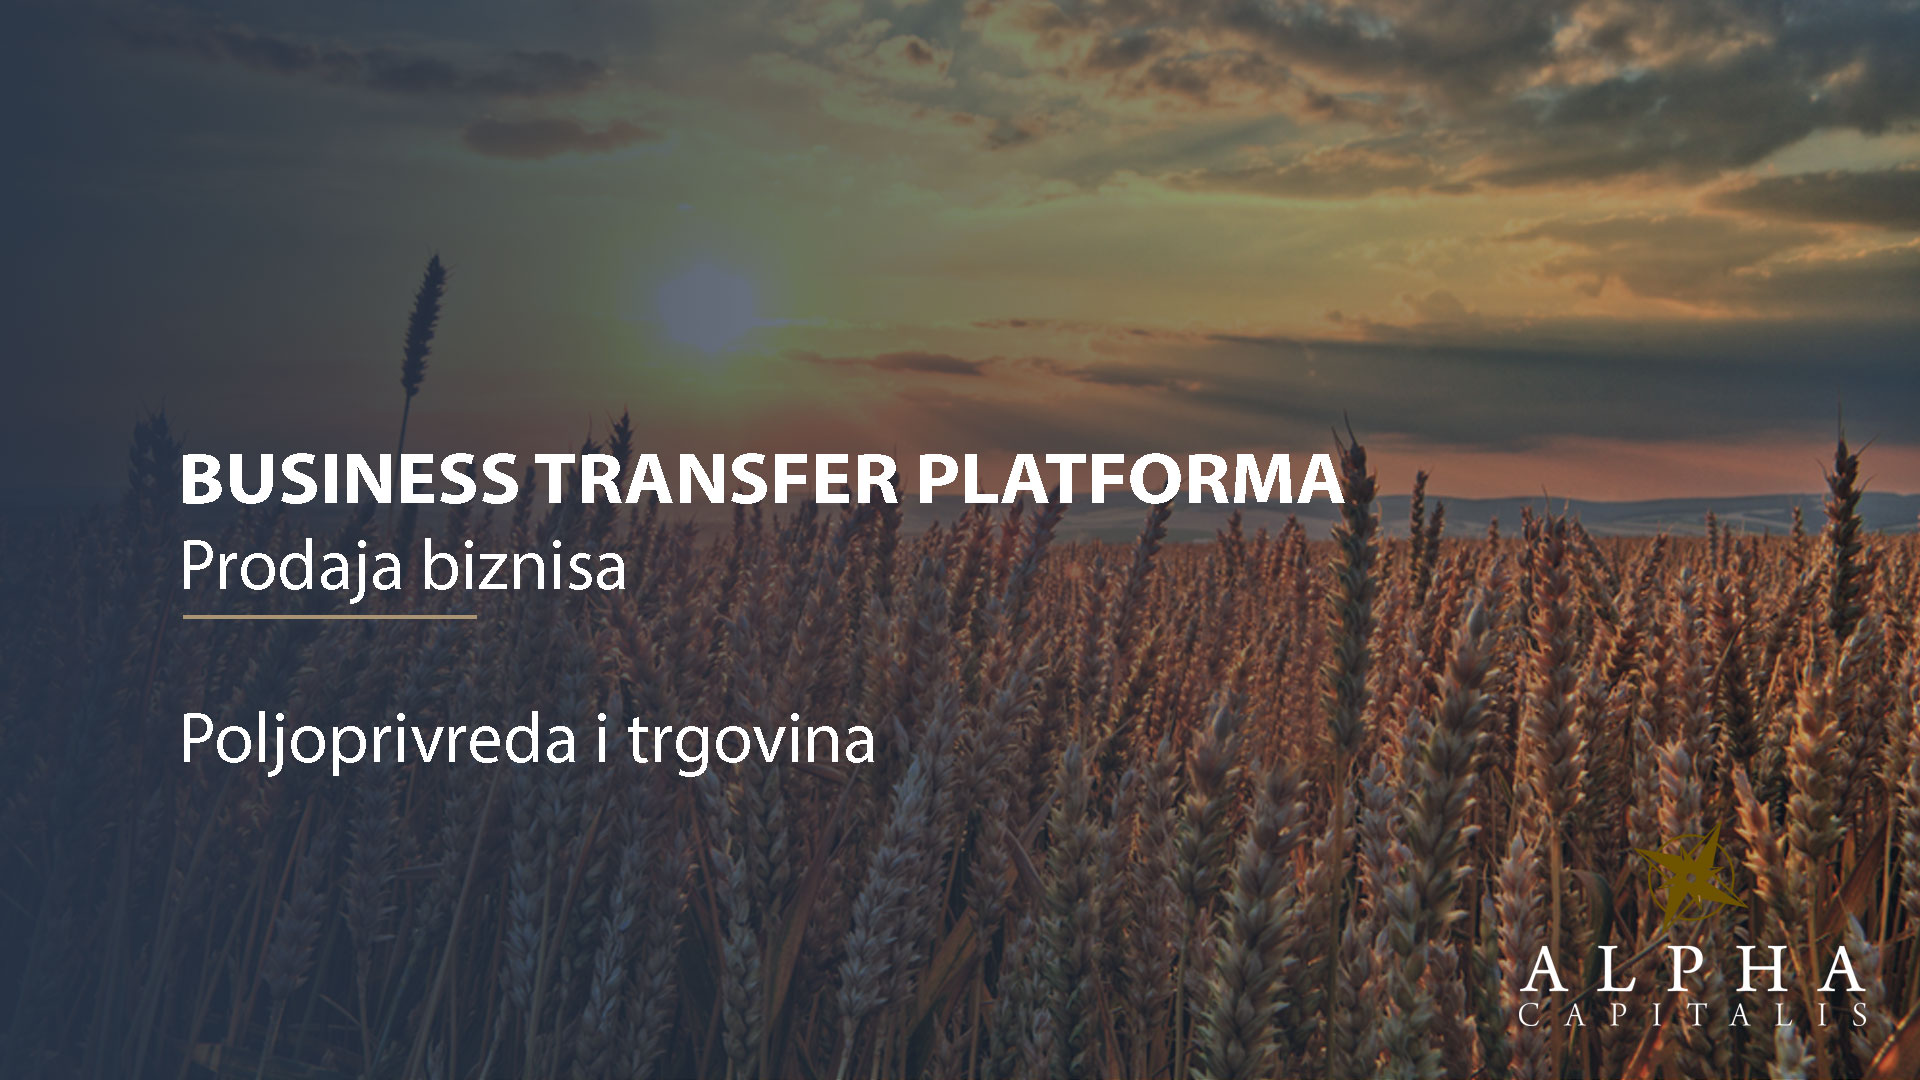 Business-transfer-platforma-prodaja-biznisa-poljoprivreda-trgovina